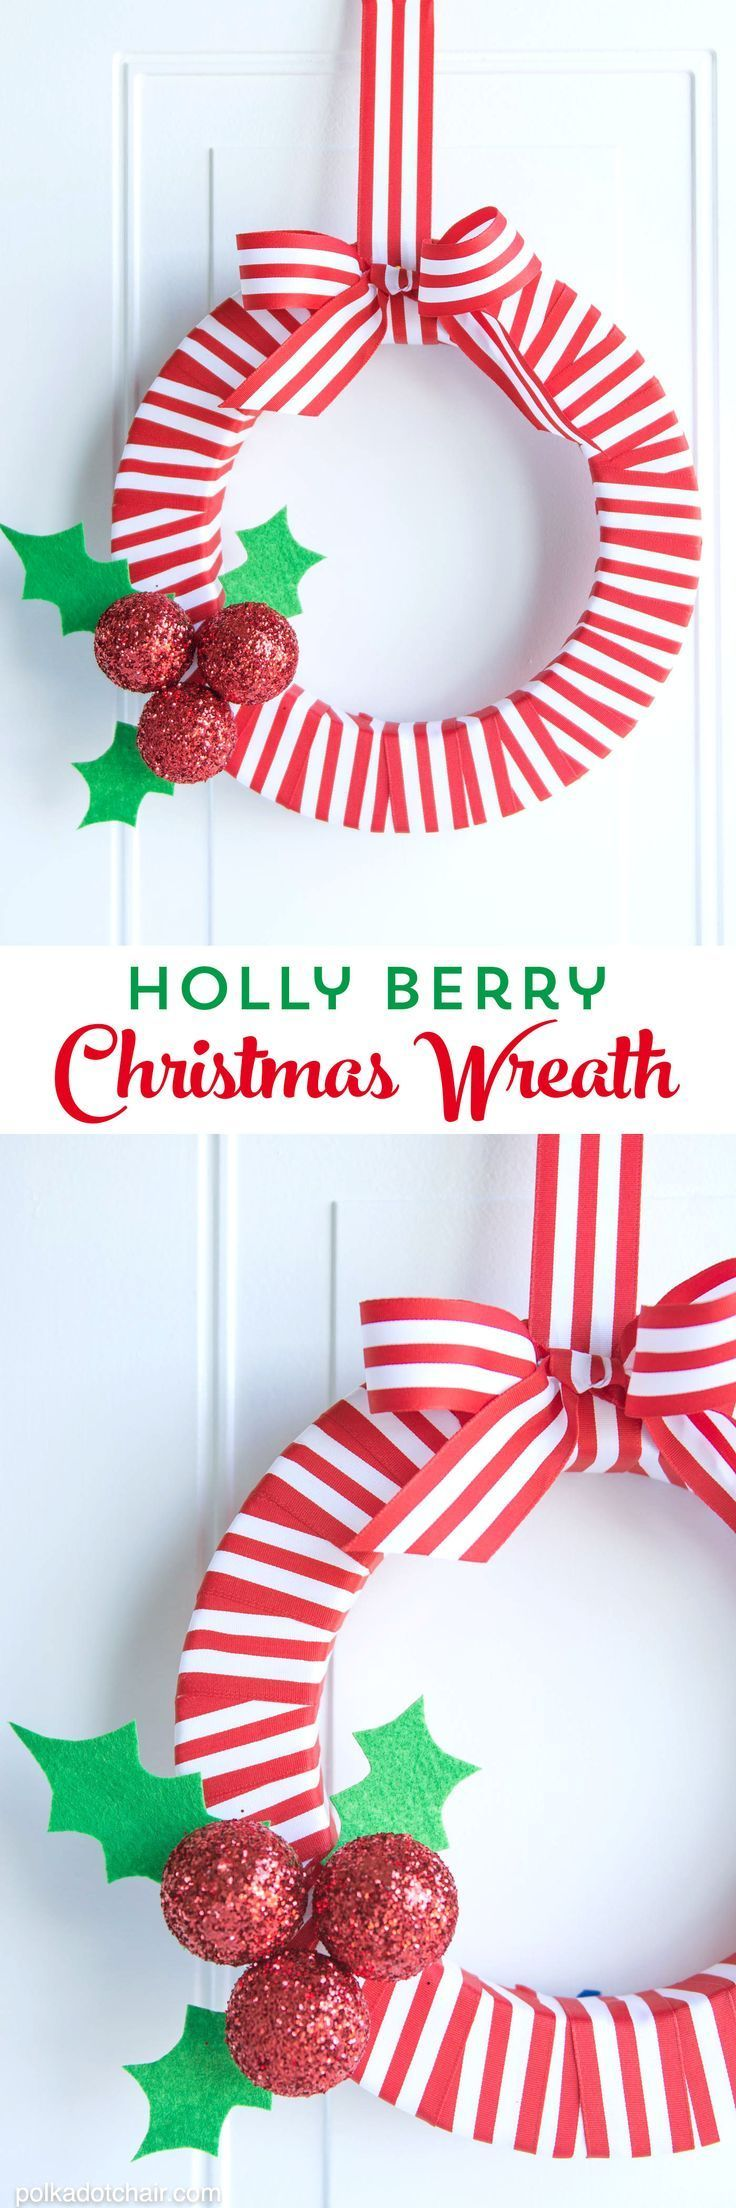 DIY Holly Berry Christmas Wreath made with ribbon, styrofoam balls, felt and glitter #christmas #ChristmasWreath #DIYWreath #christmascrafts